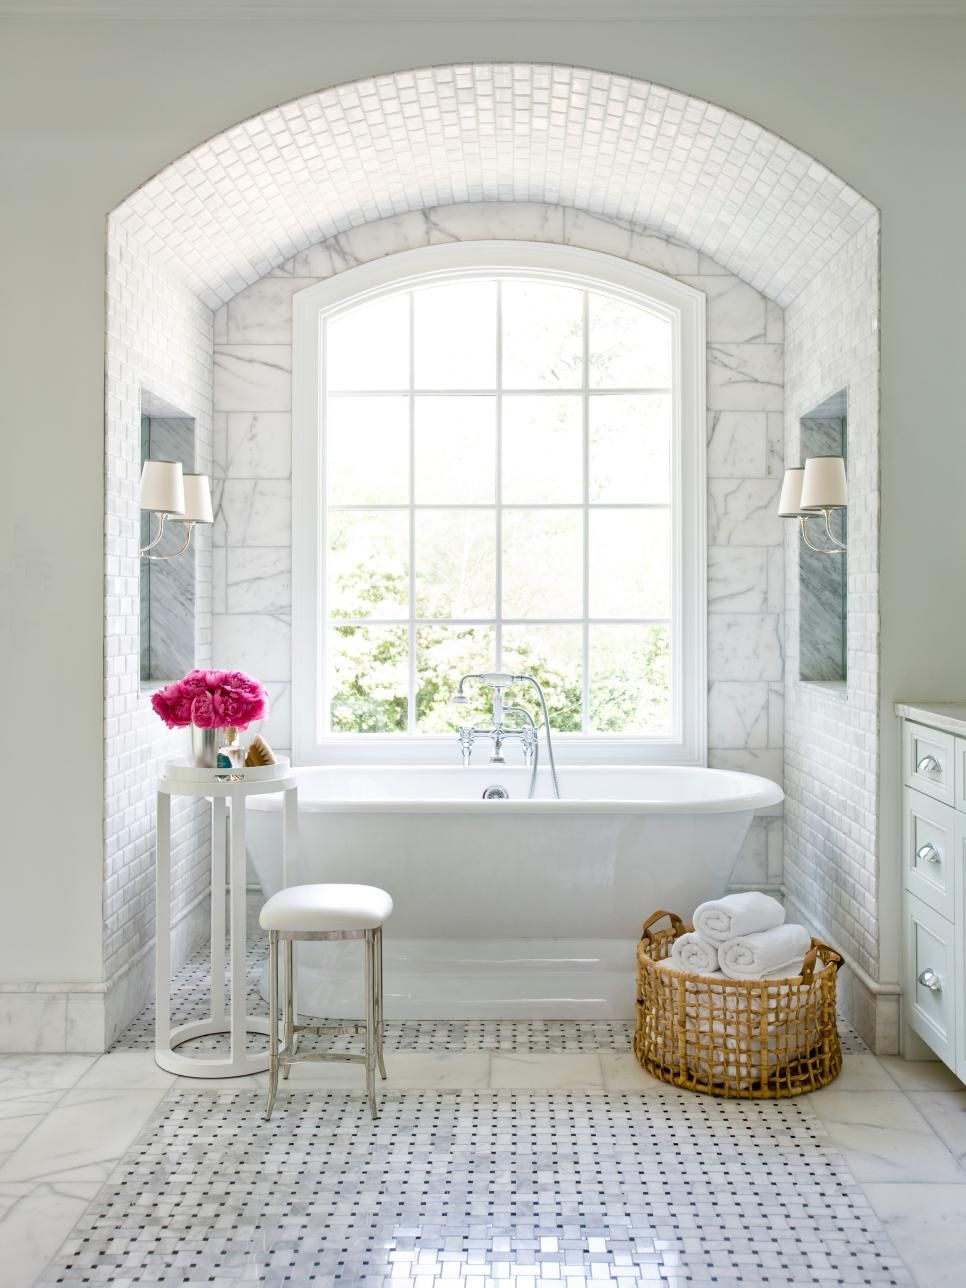 15 simply chic bathroom tile design ideas carrara marble 15 simply chic bathroom tile design ideas doublecrazyfo Choice Image